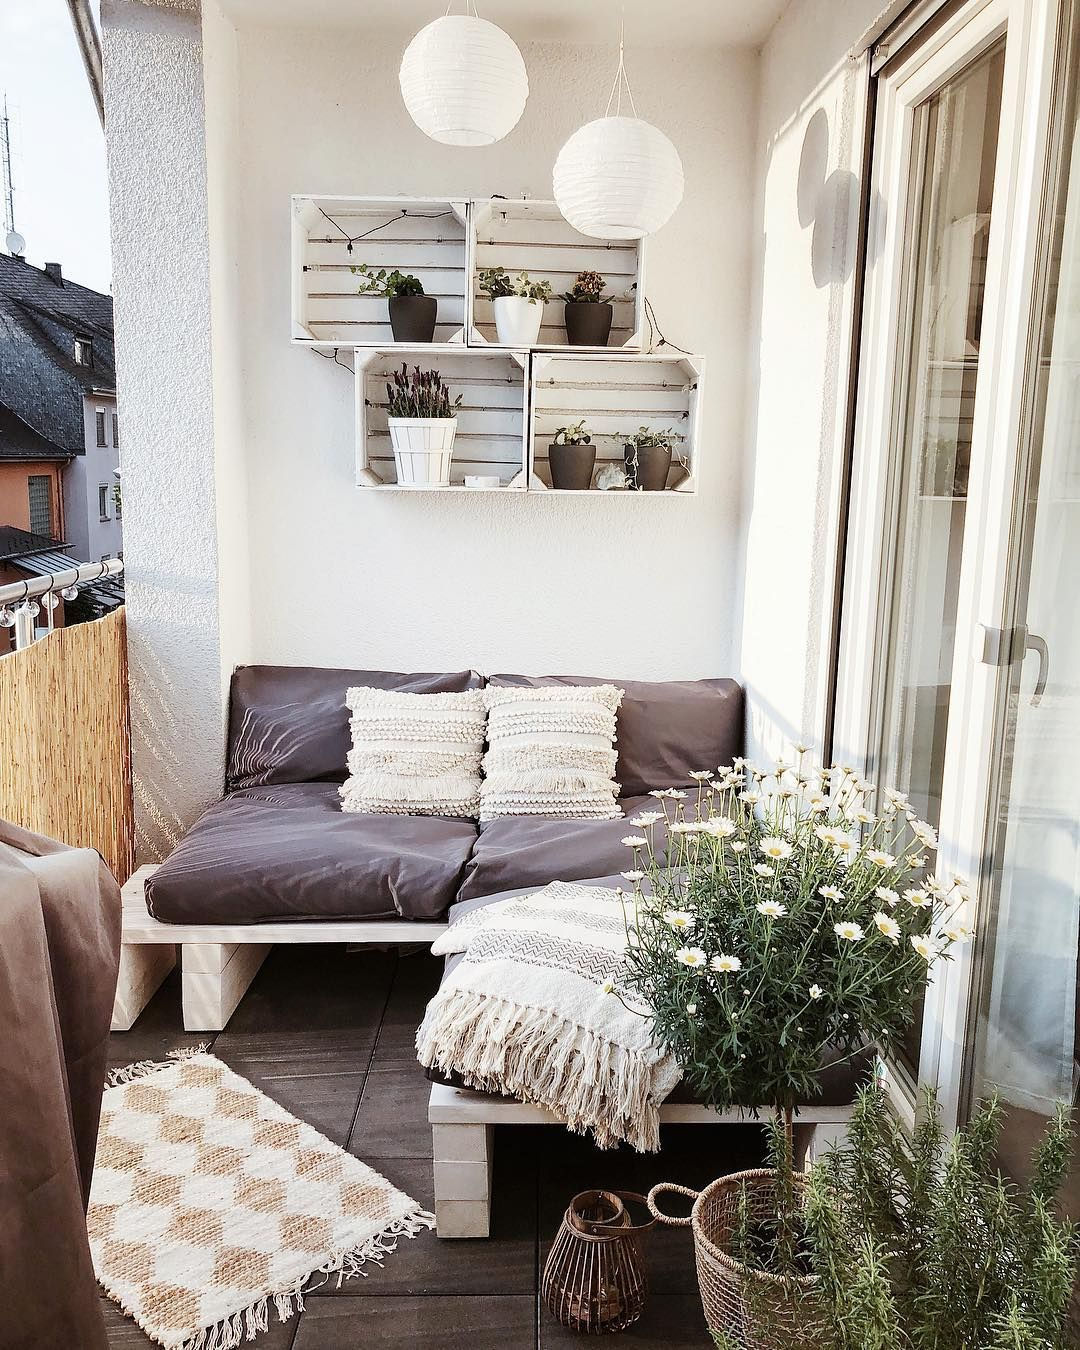 Kleinen Balkon gestalten: DIY Sitzecke und Deko #balkondeko